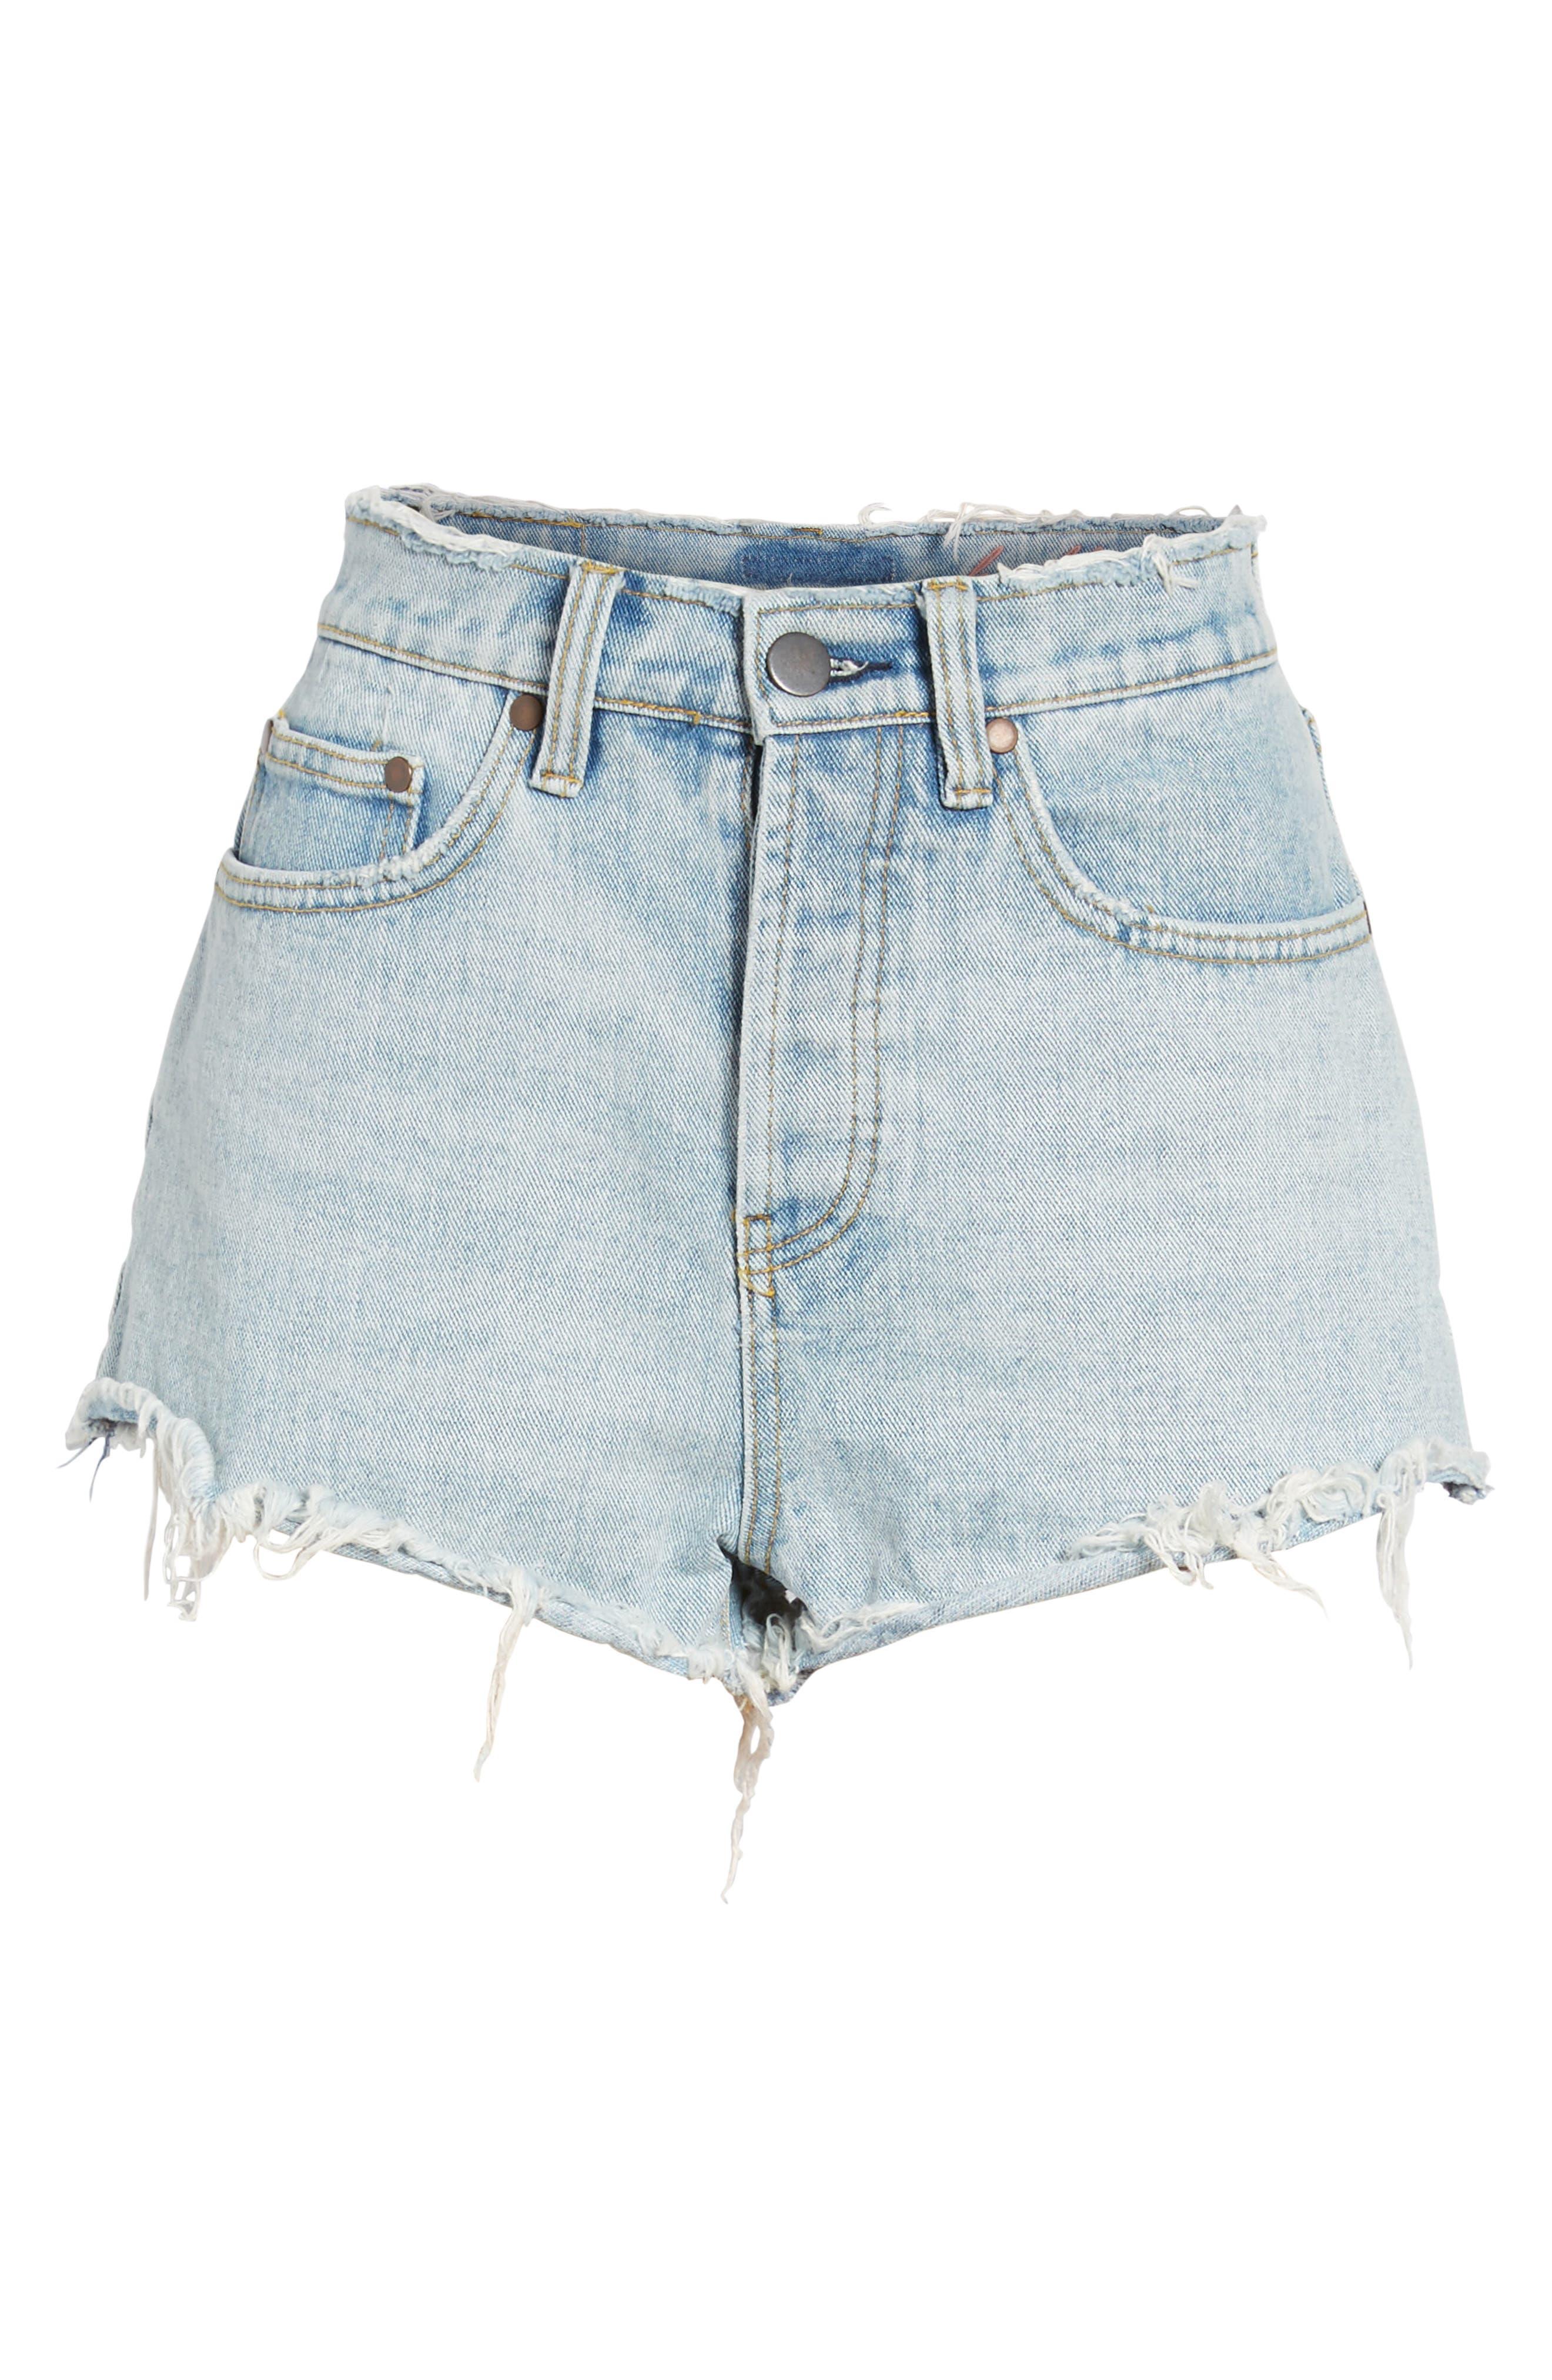 Denim Shorts,                             Alternate thumbnail 6, color,                             Sea Wash